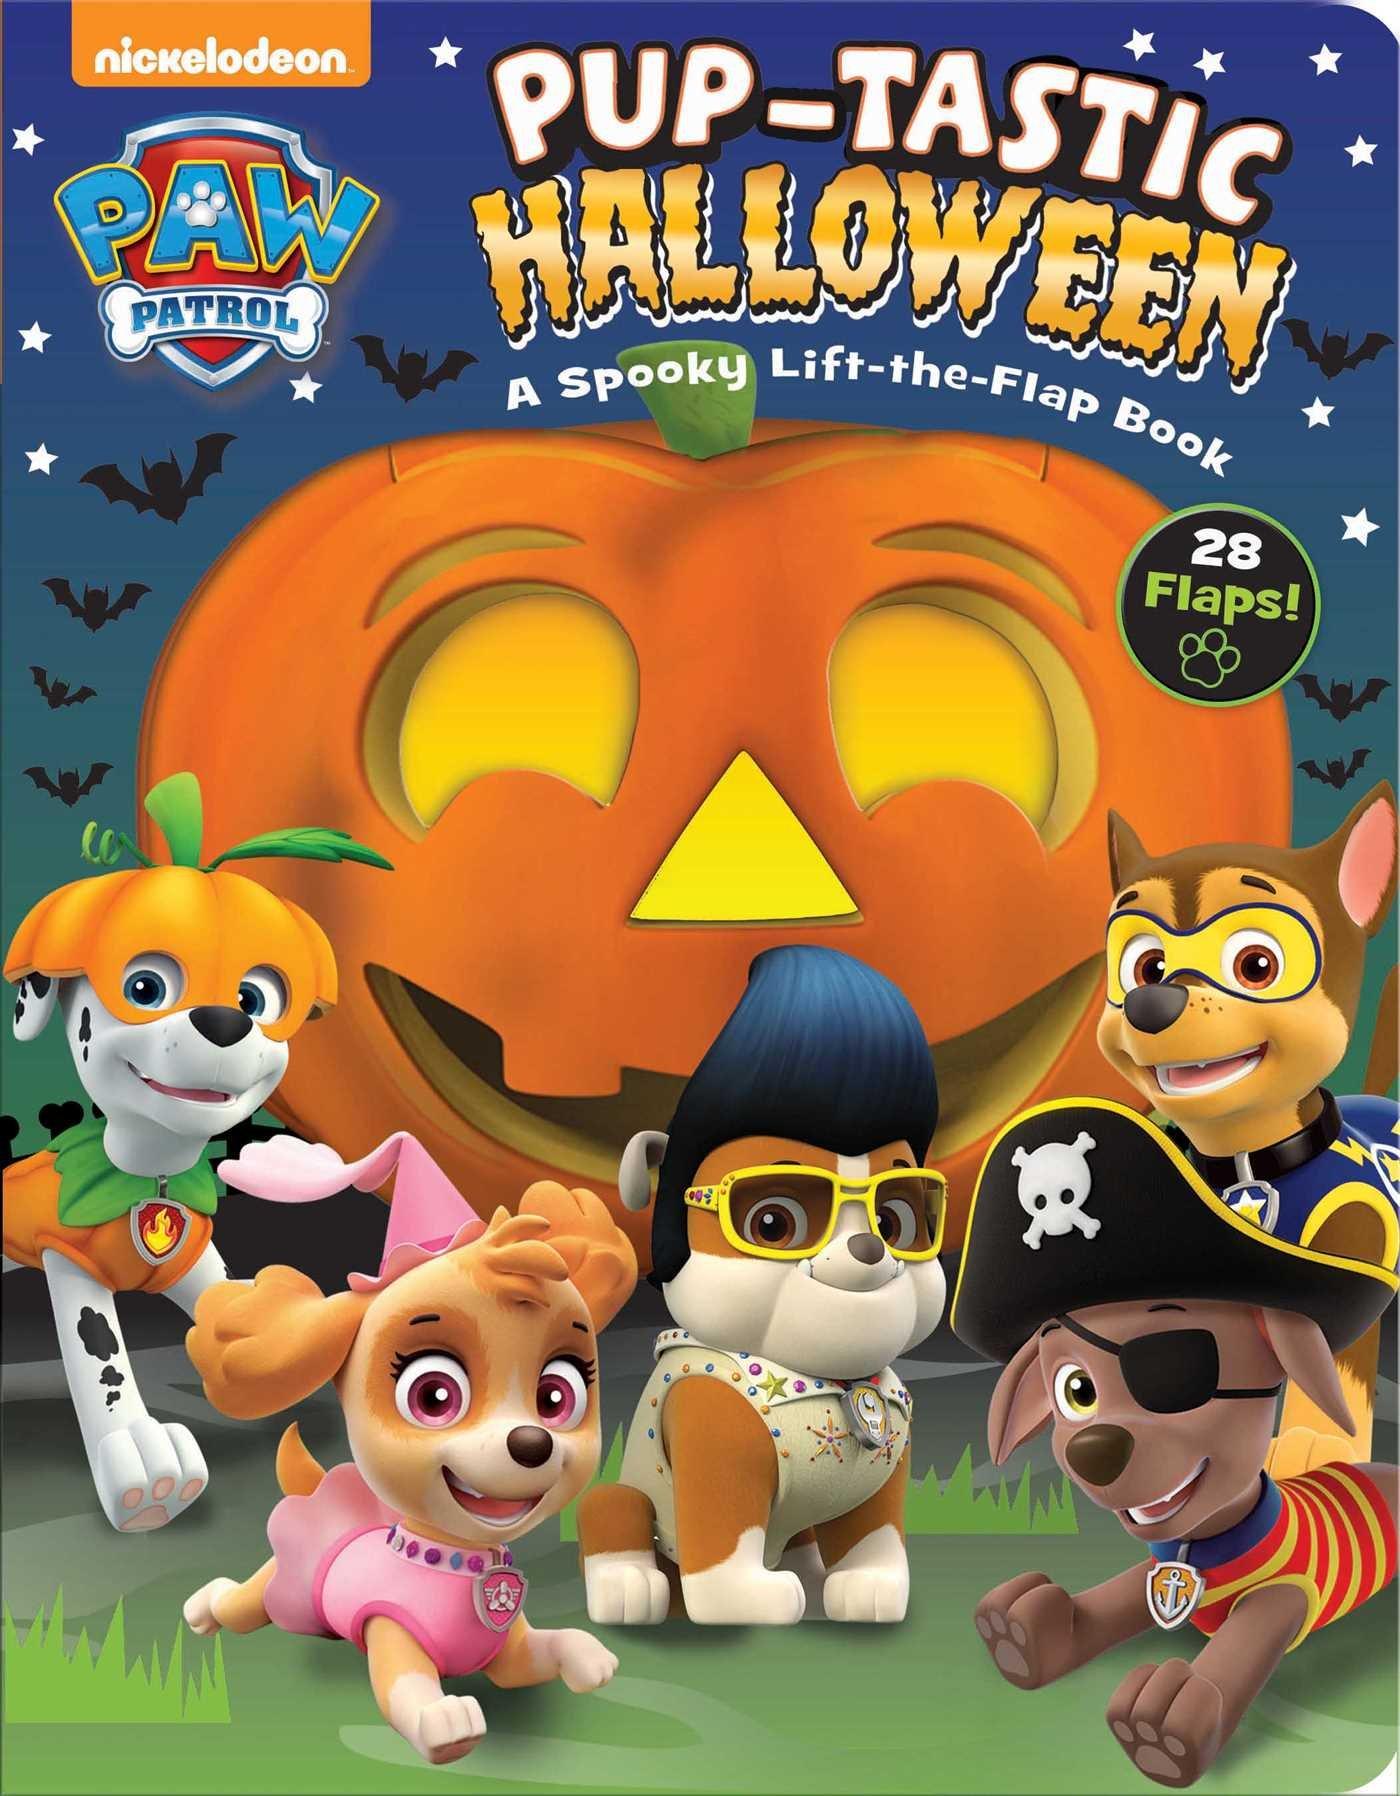 PAW Patrol: Pup-tastic Halloween: A Spooky Lift-the-Flap Book pdf